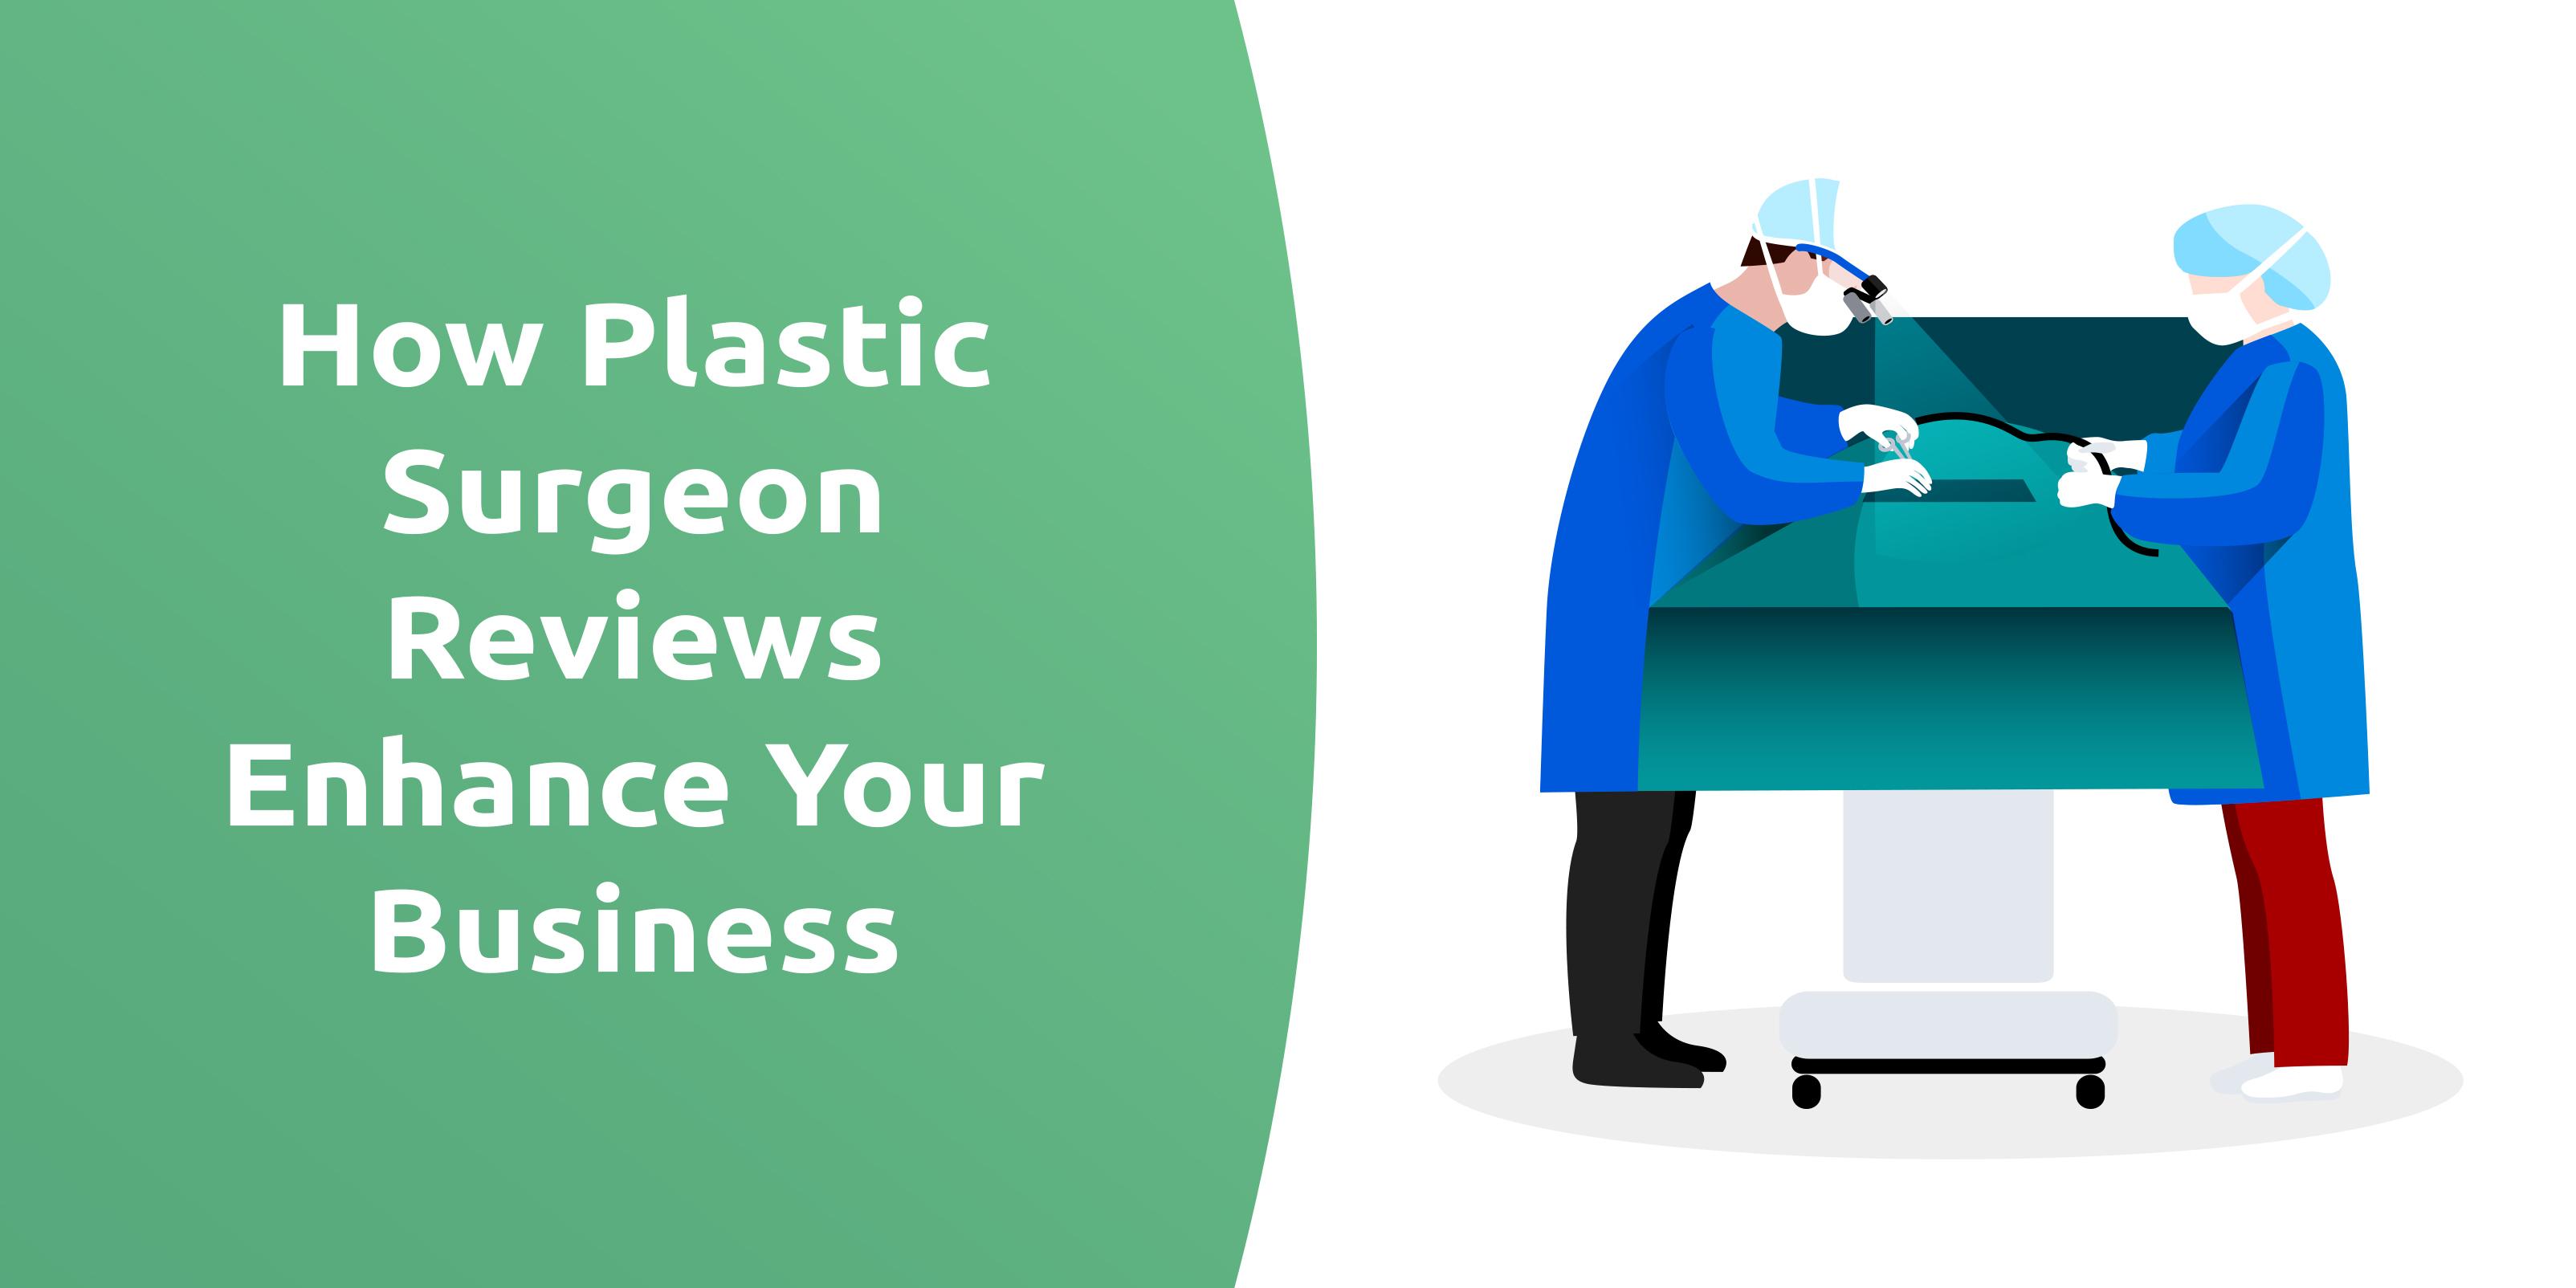 How Plastic Surgeon Reviews Enhance Your Business